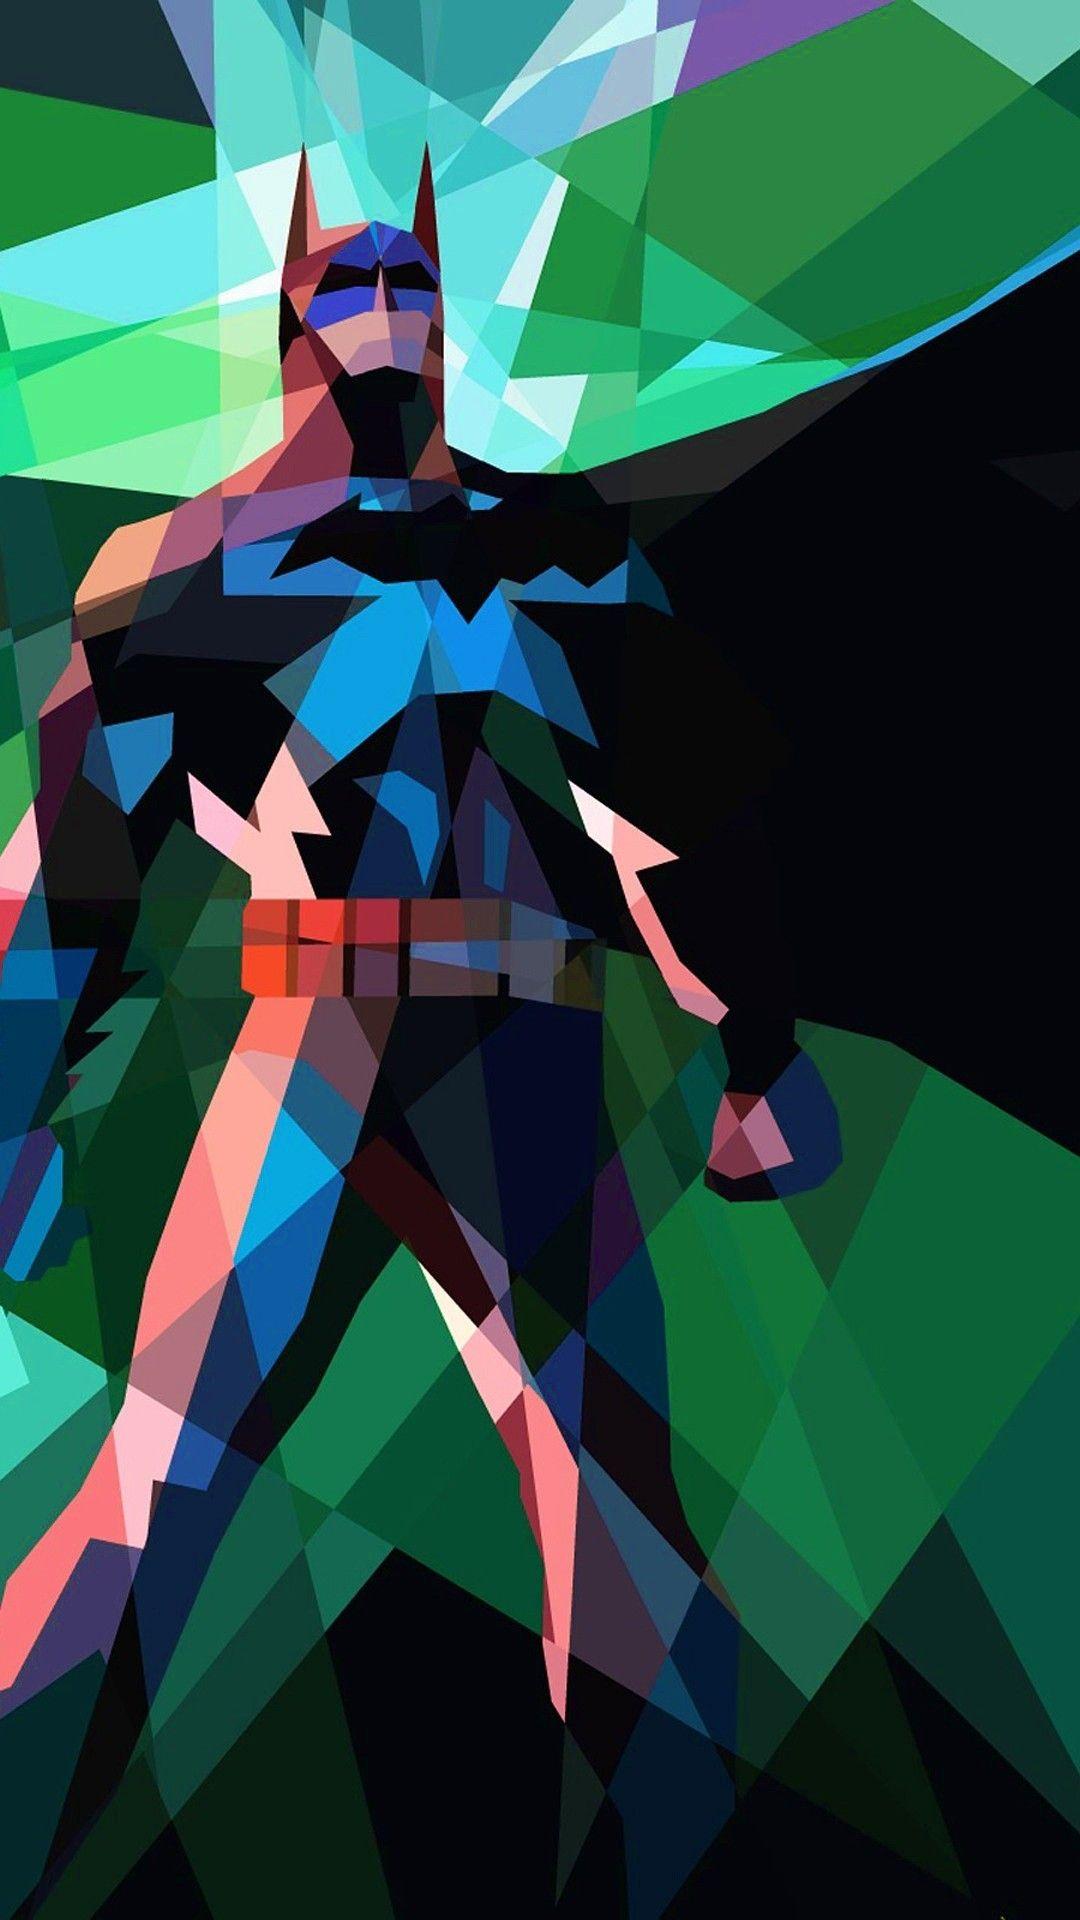 1080x1920 1080x1920 Vertical Hd Phone Wallpapers 1080x1920 Superhero Wallpaper Batman Wallpaper Batman Wallpaper Iphone